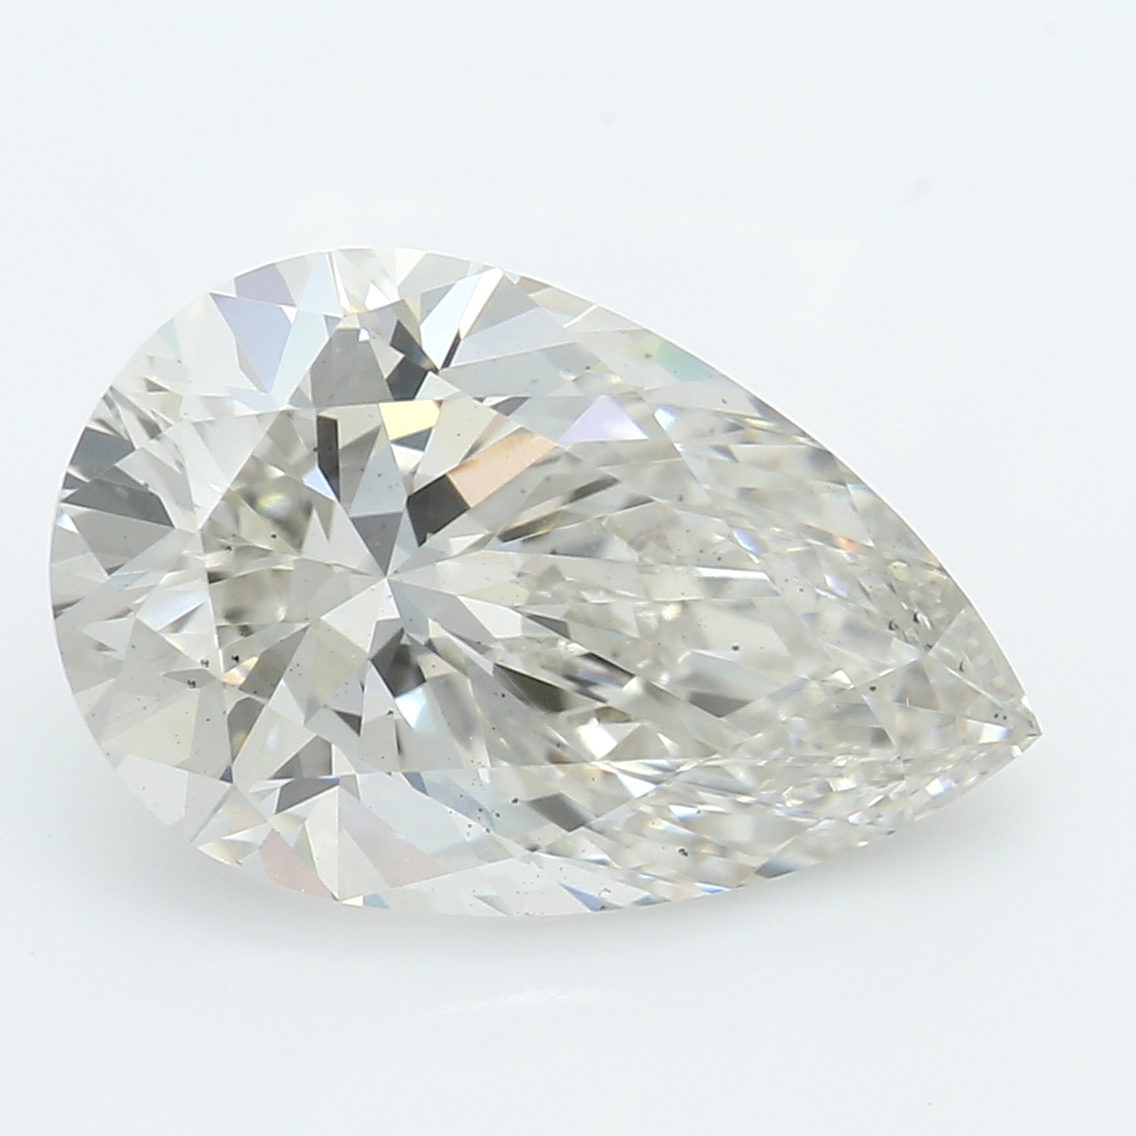 2.15 Carat I-SI1 Excellent Pear Diamond